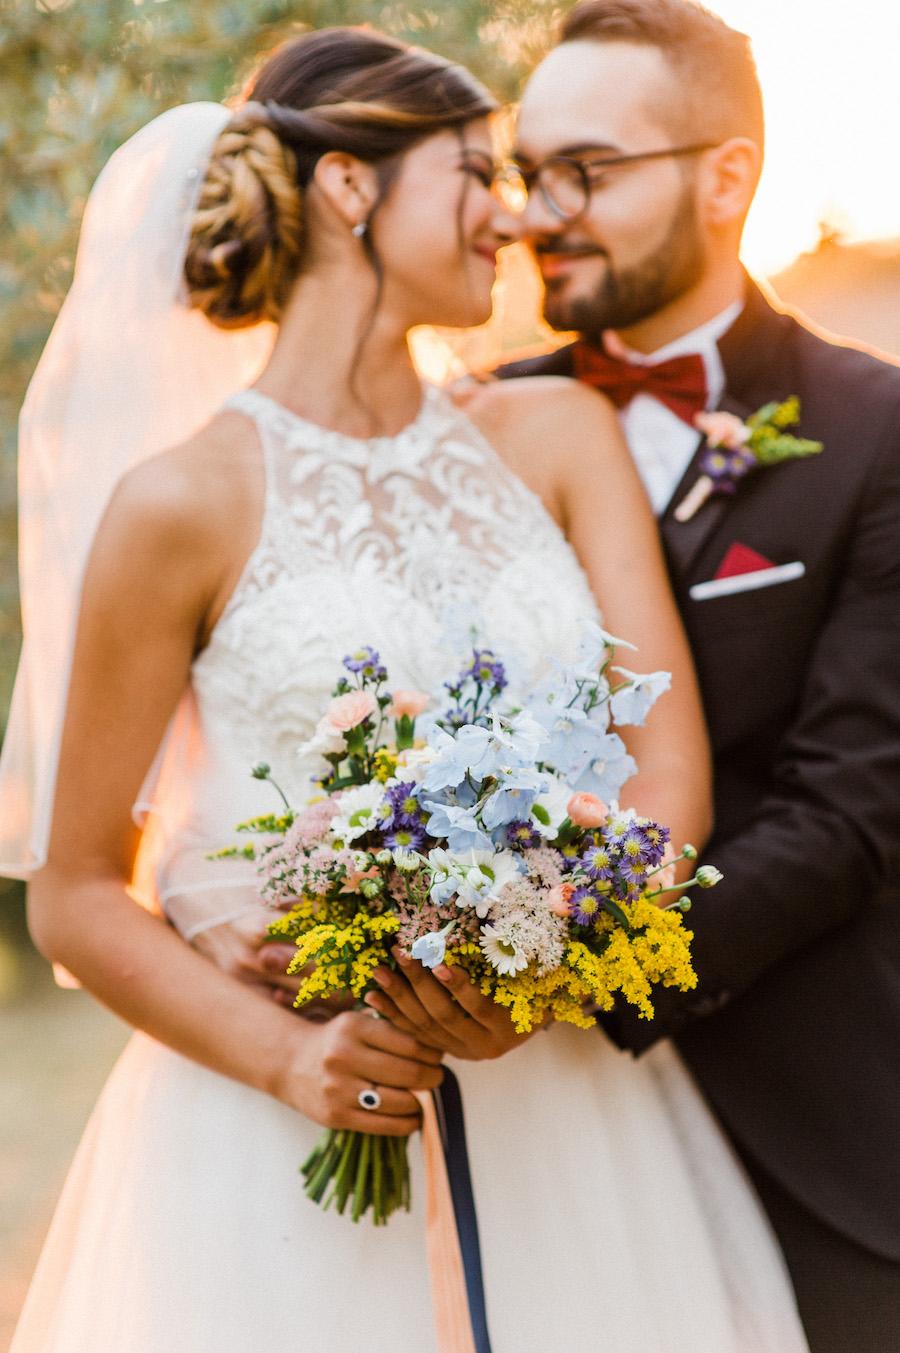 matrimonio autunnale a tema stelle